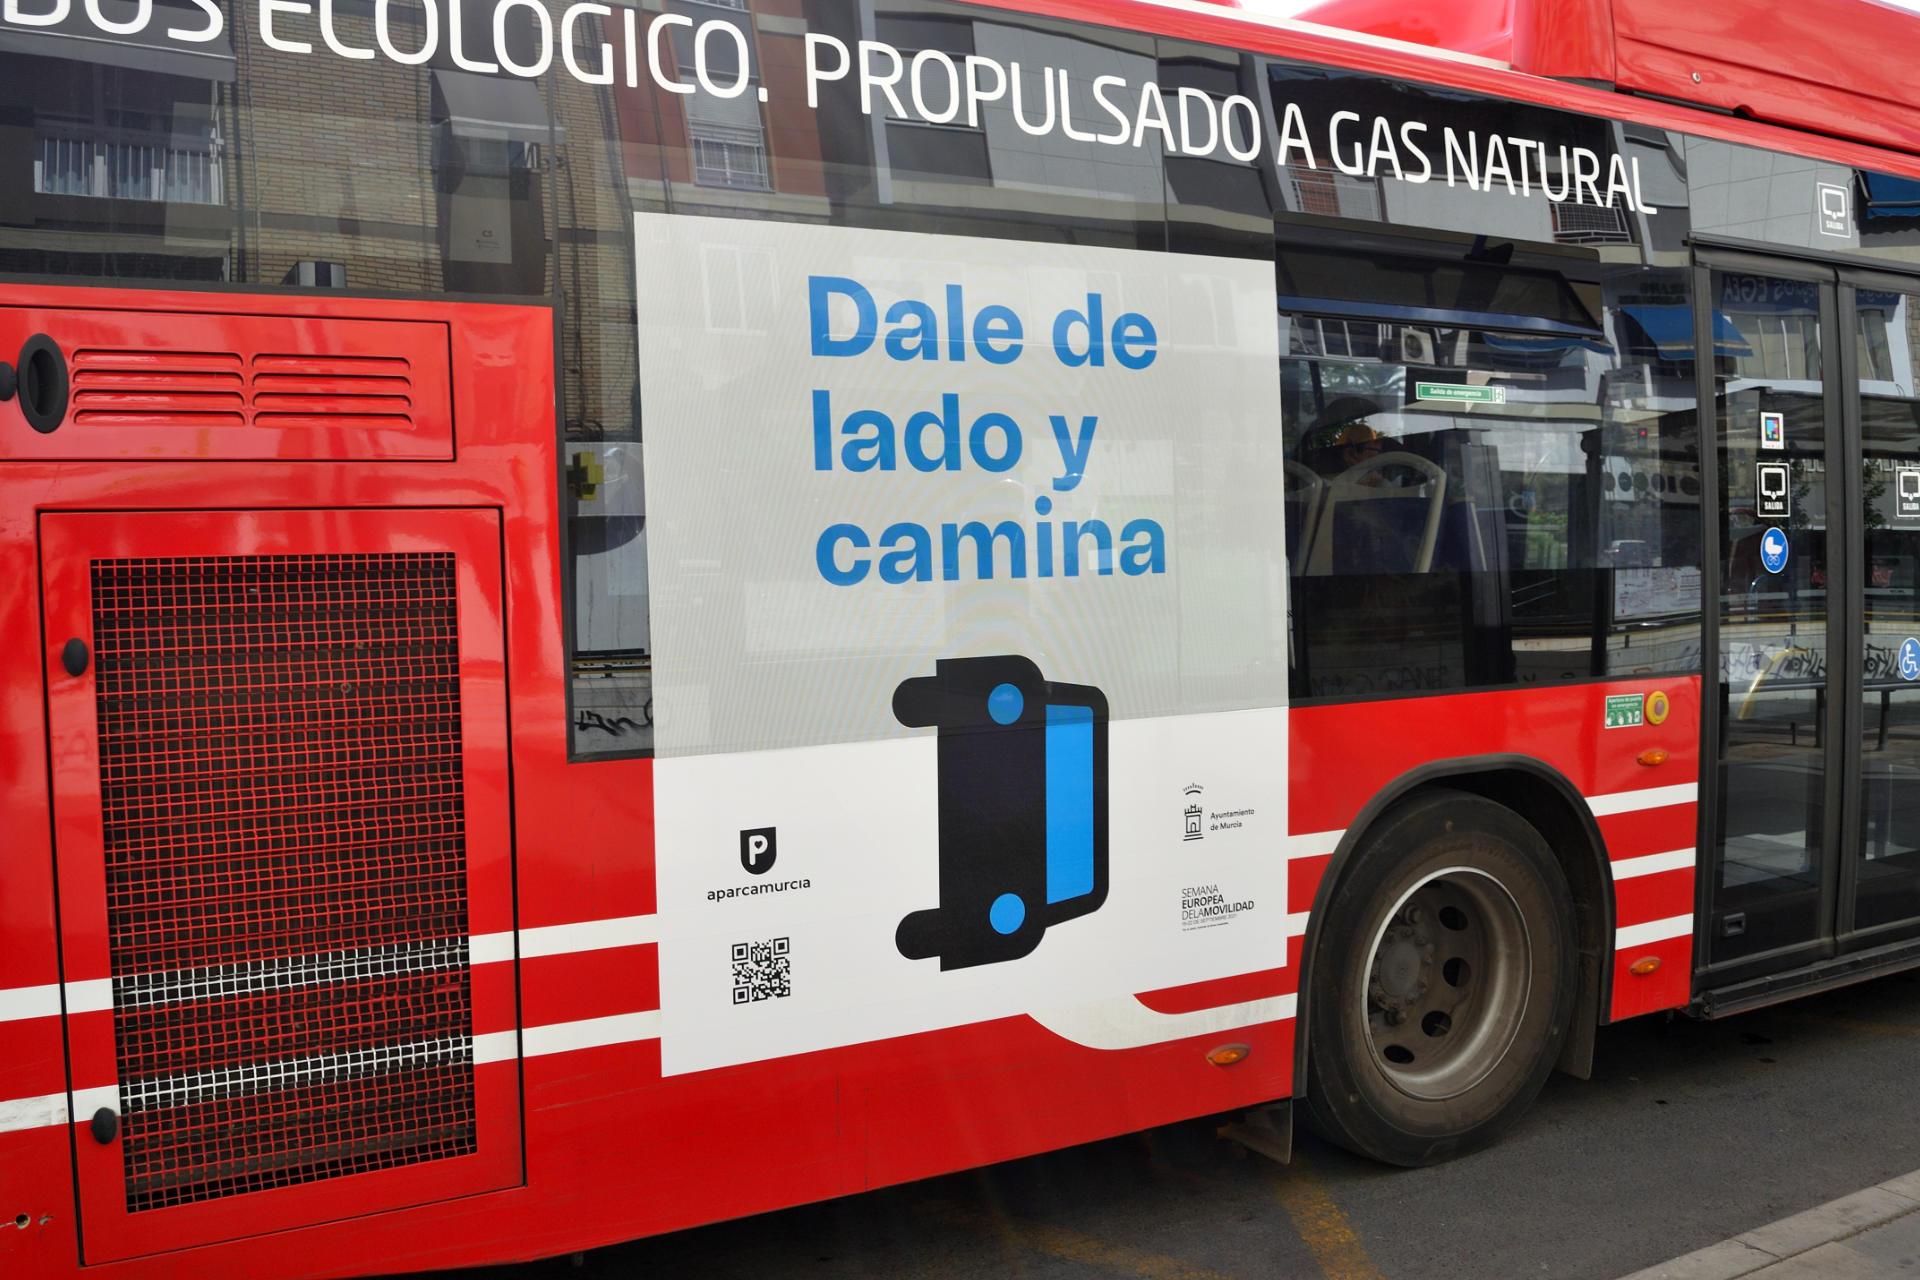 Campaña Aparcamurcia 2021 en bus